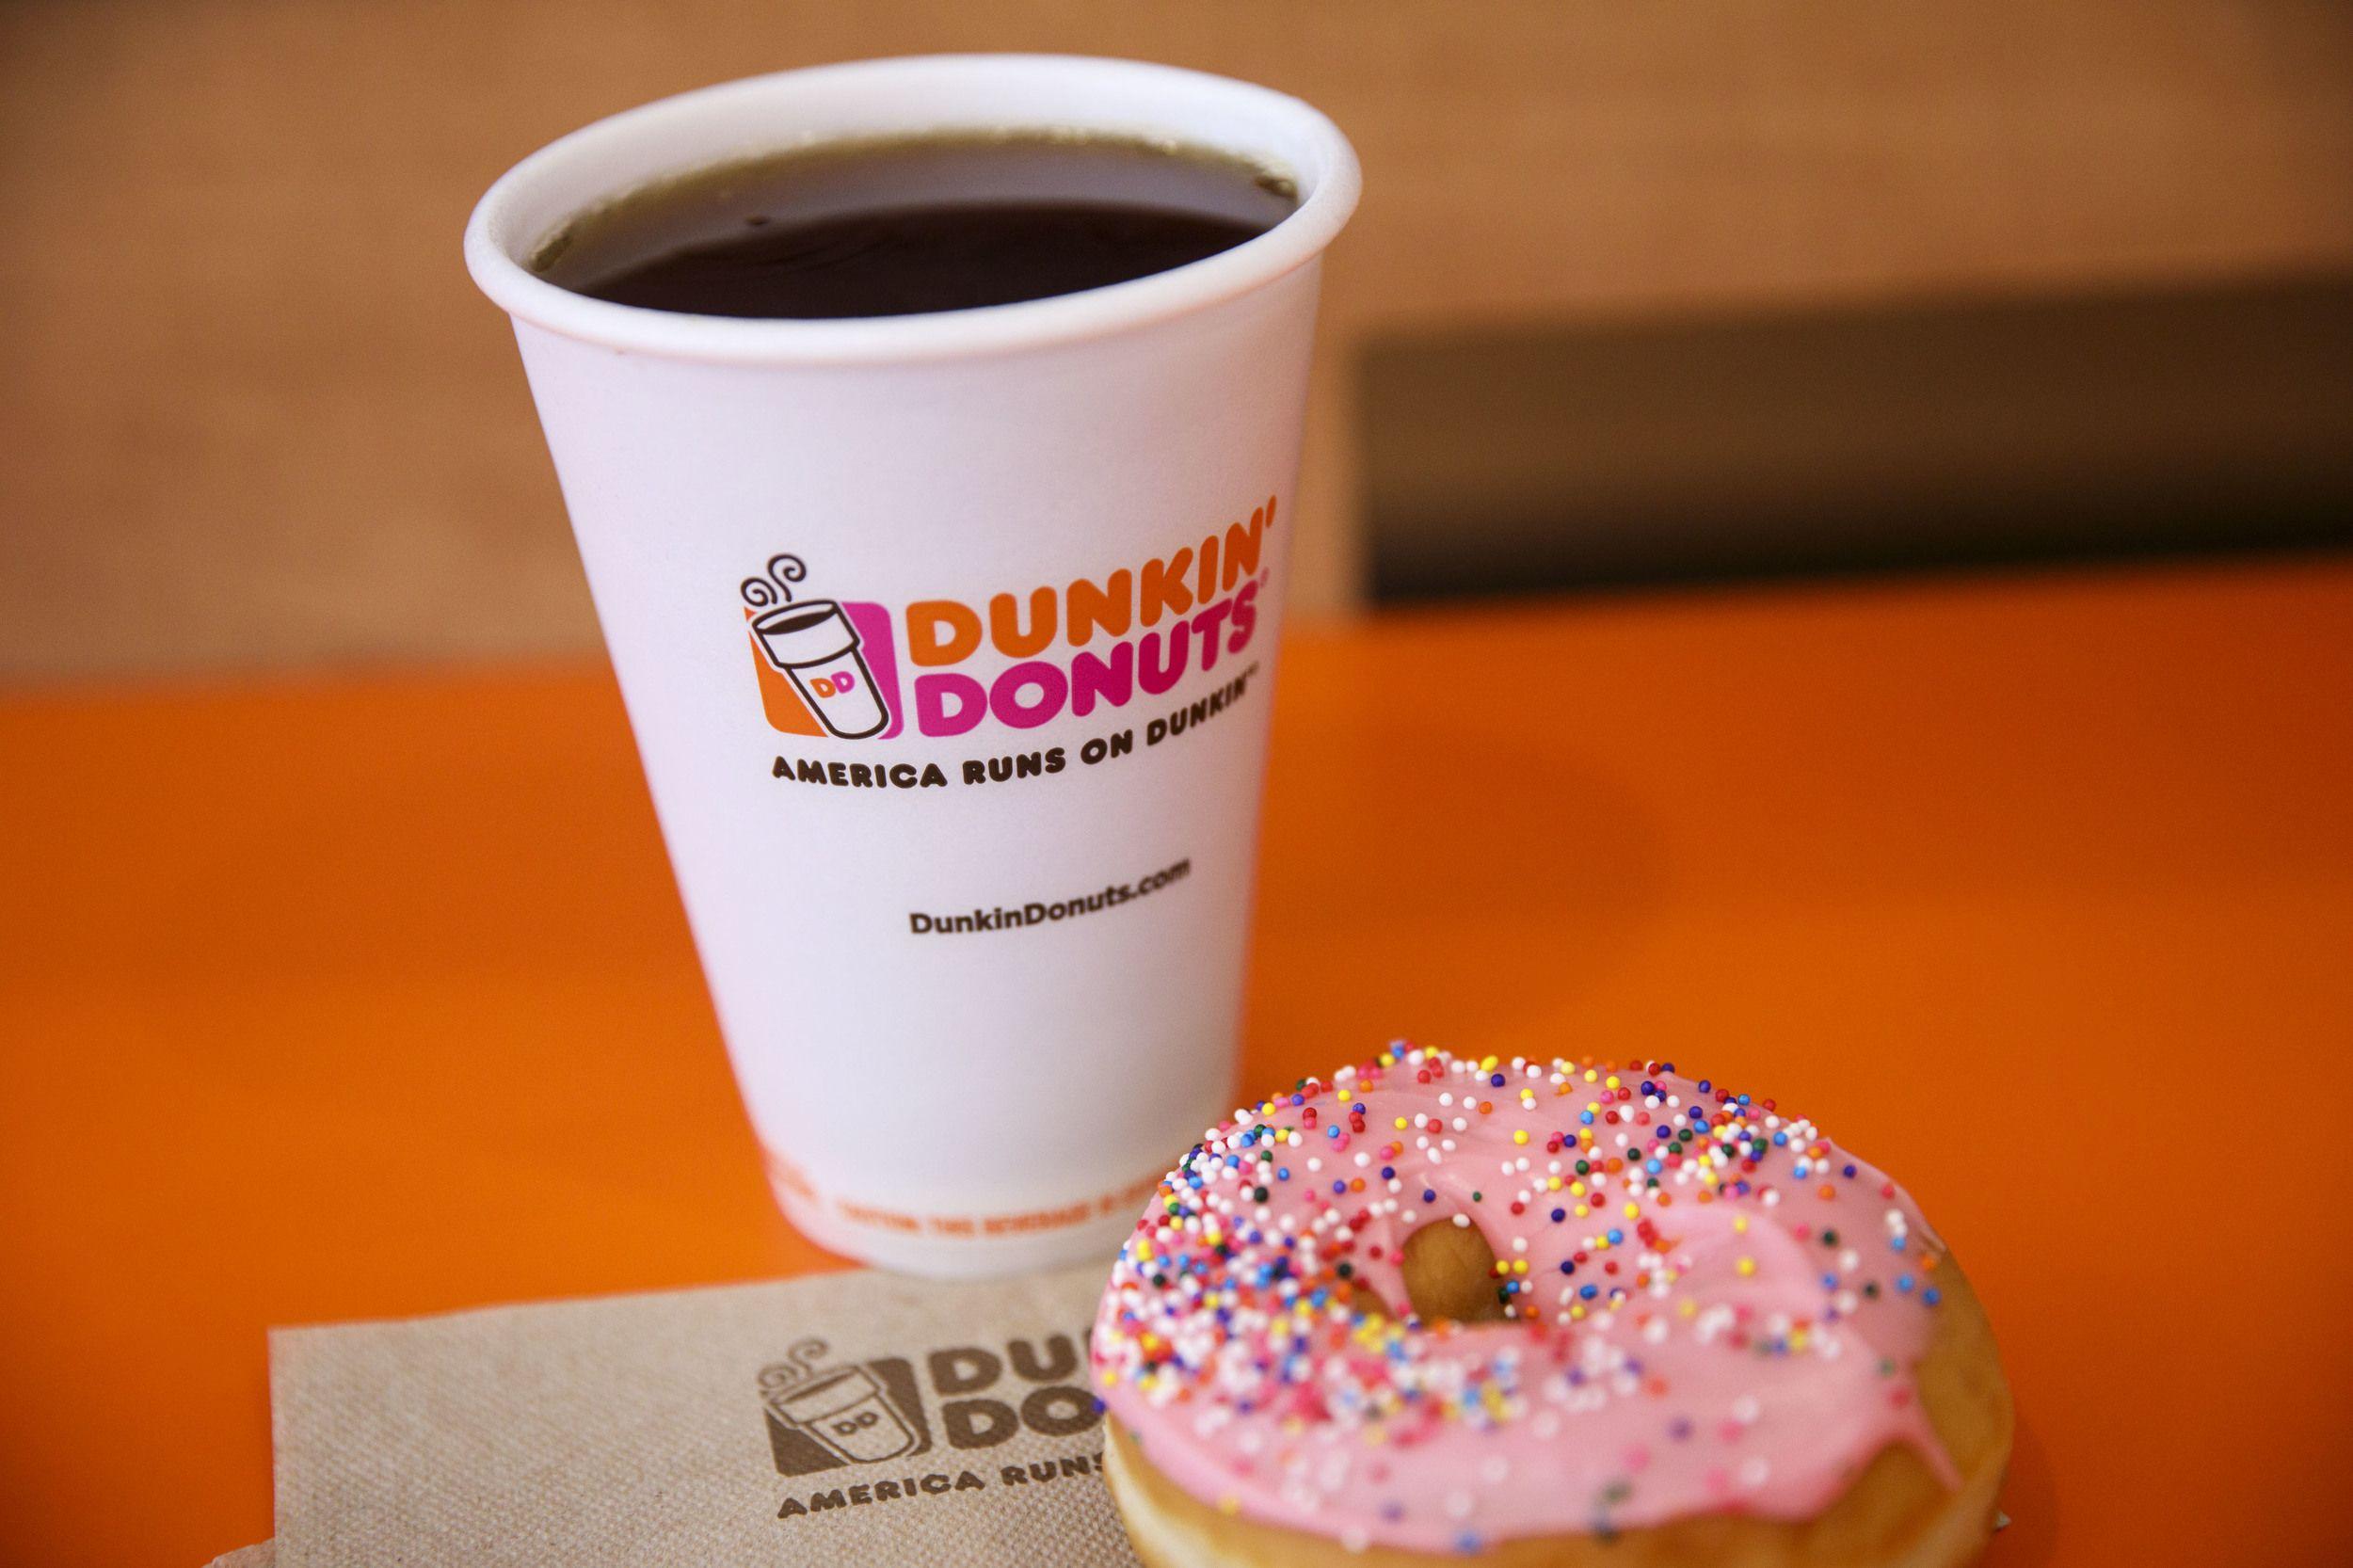 fd355b757f49d57e87c326eb3f6d30a7 - Dunkin Donuts Baskin Robbins Online Application